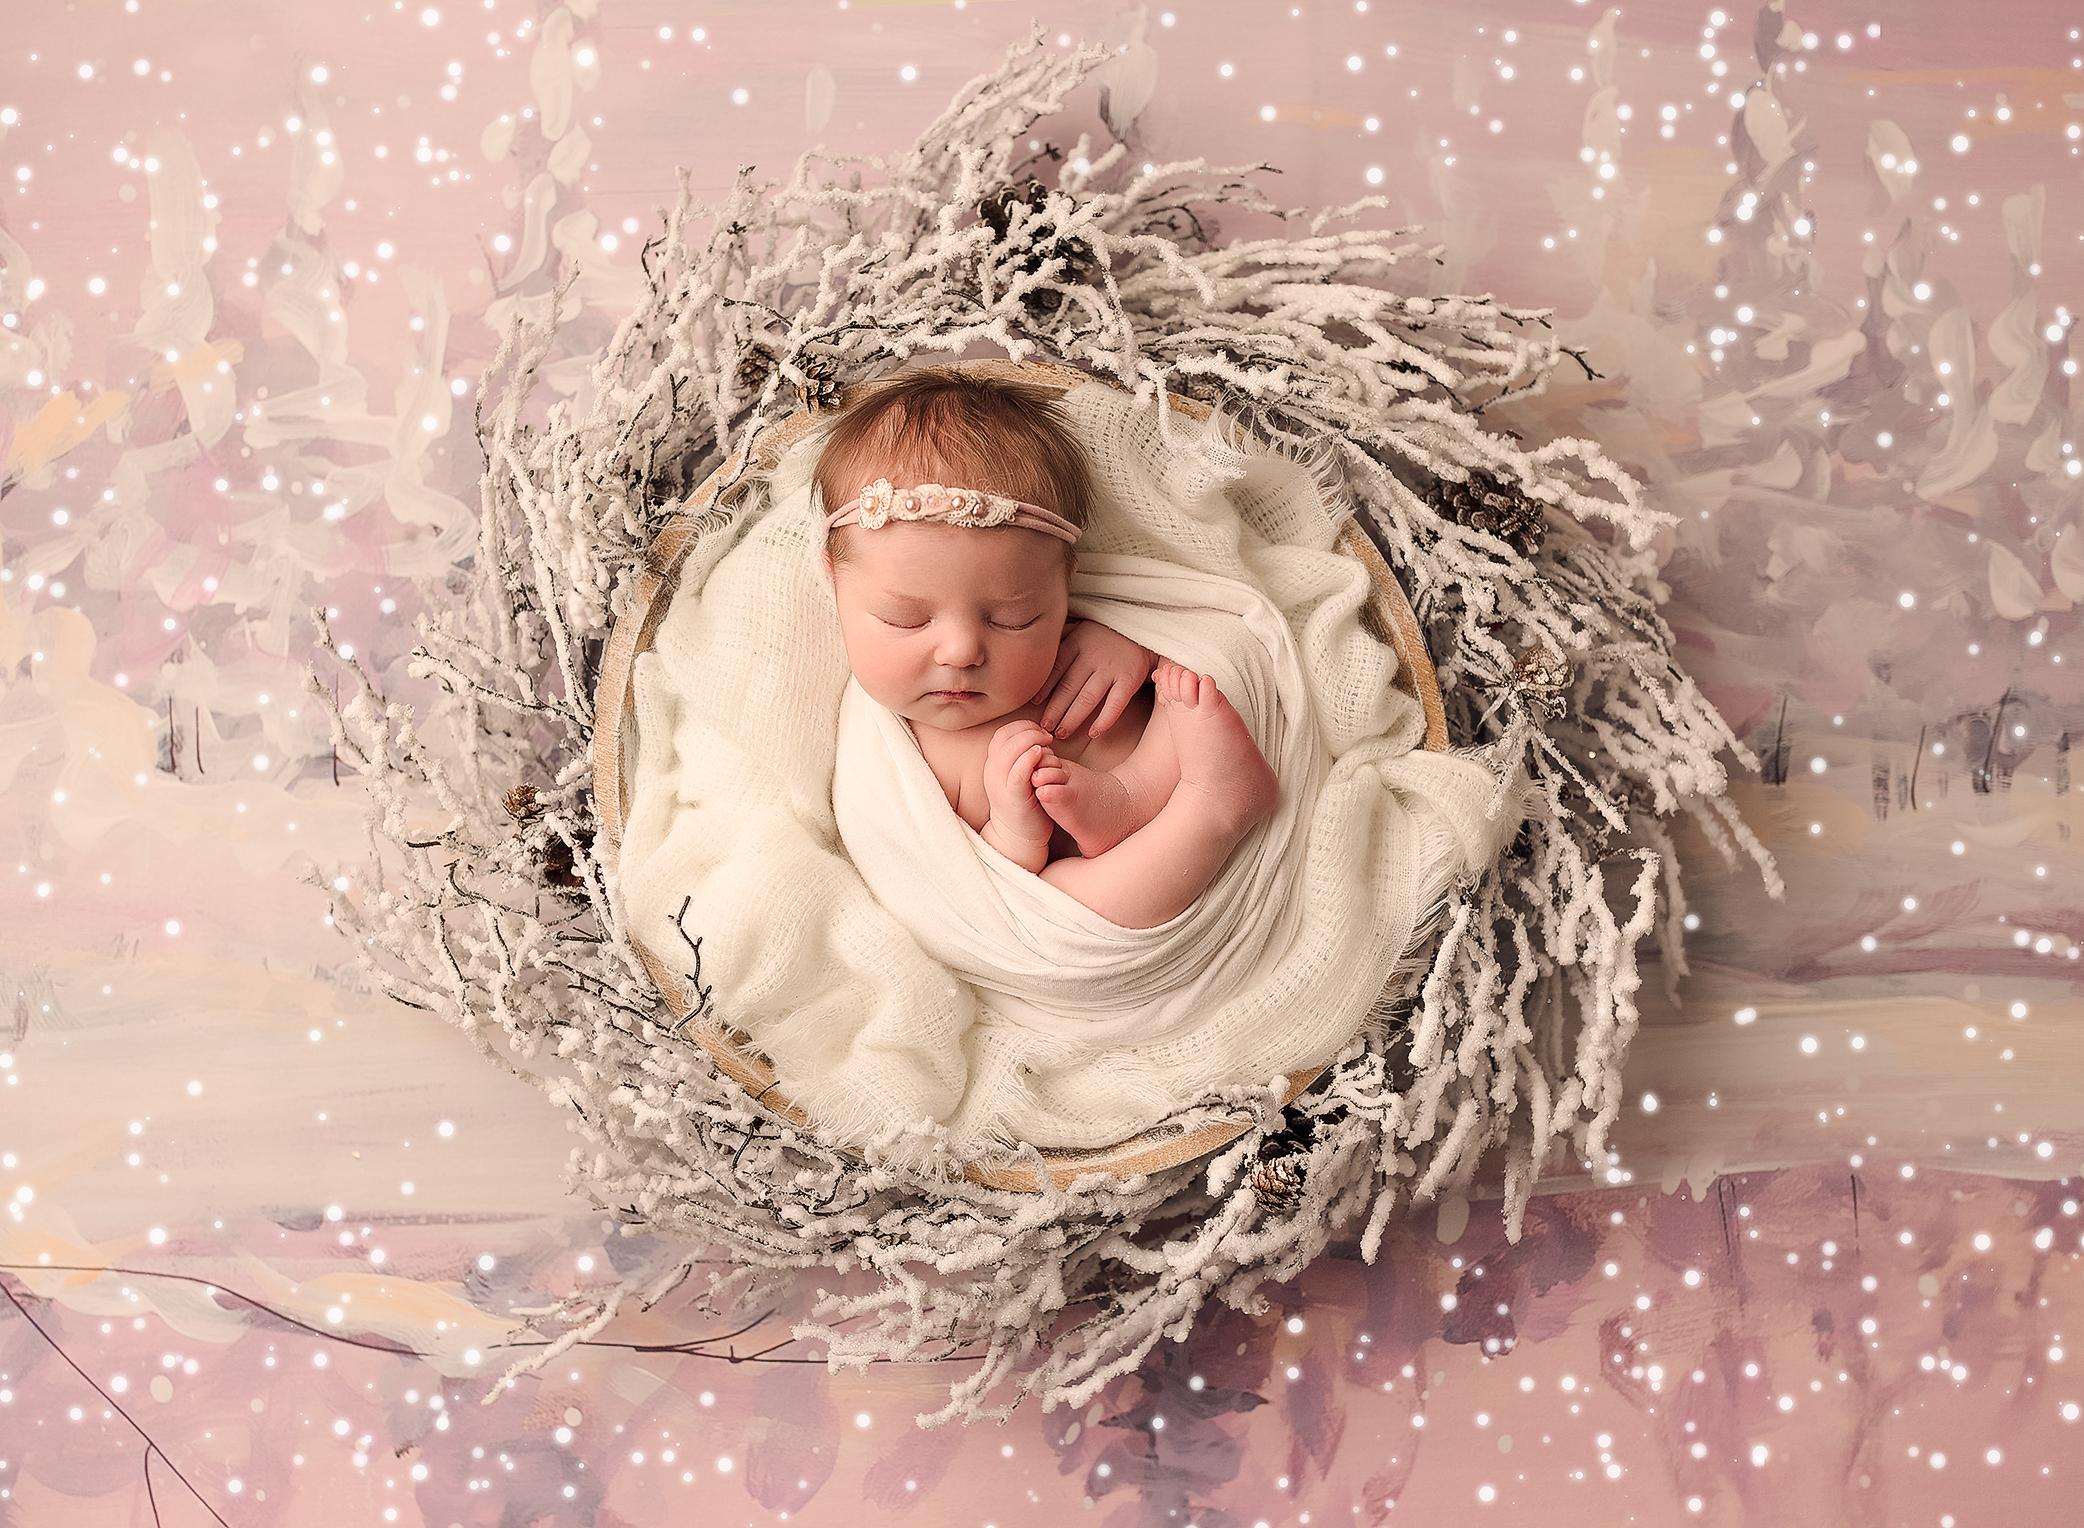 newborn baby girl snow winter setup